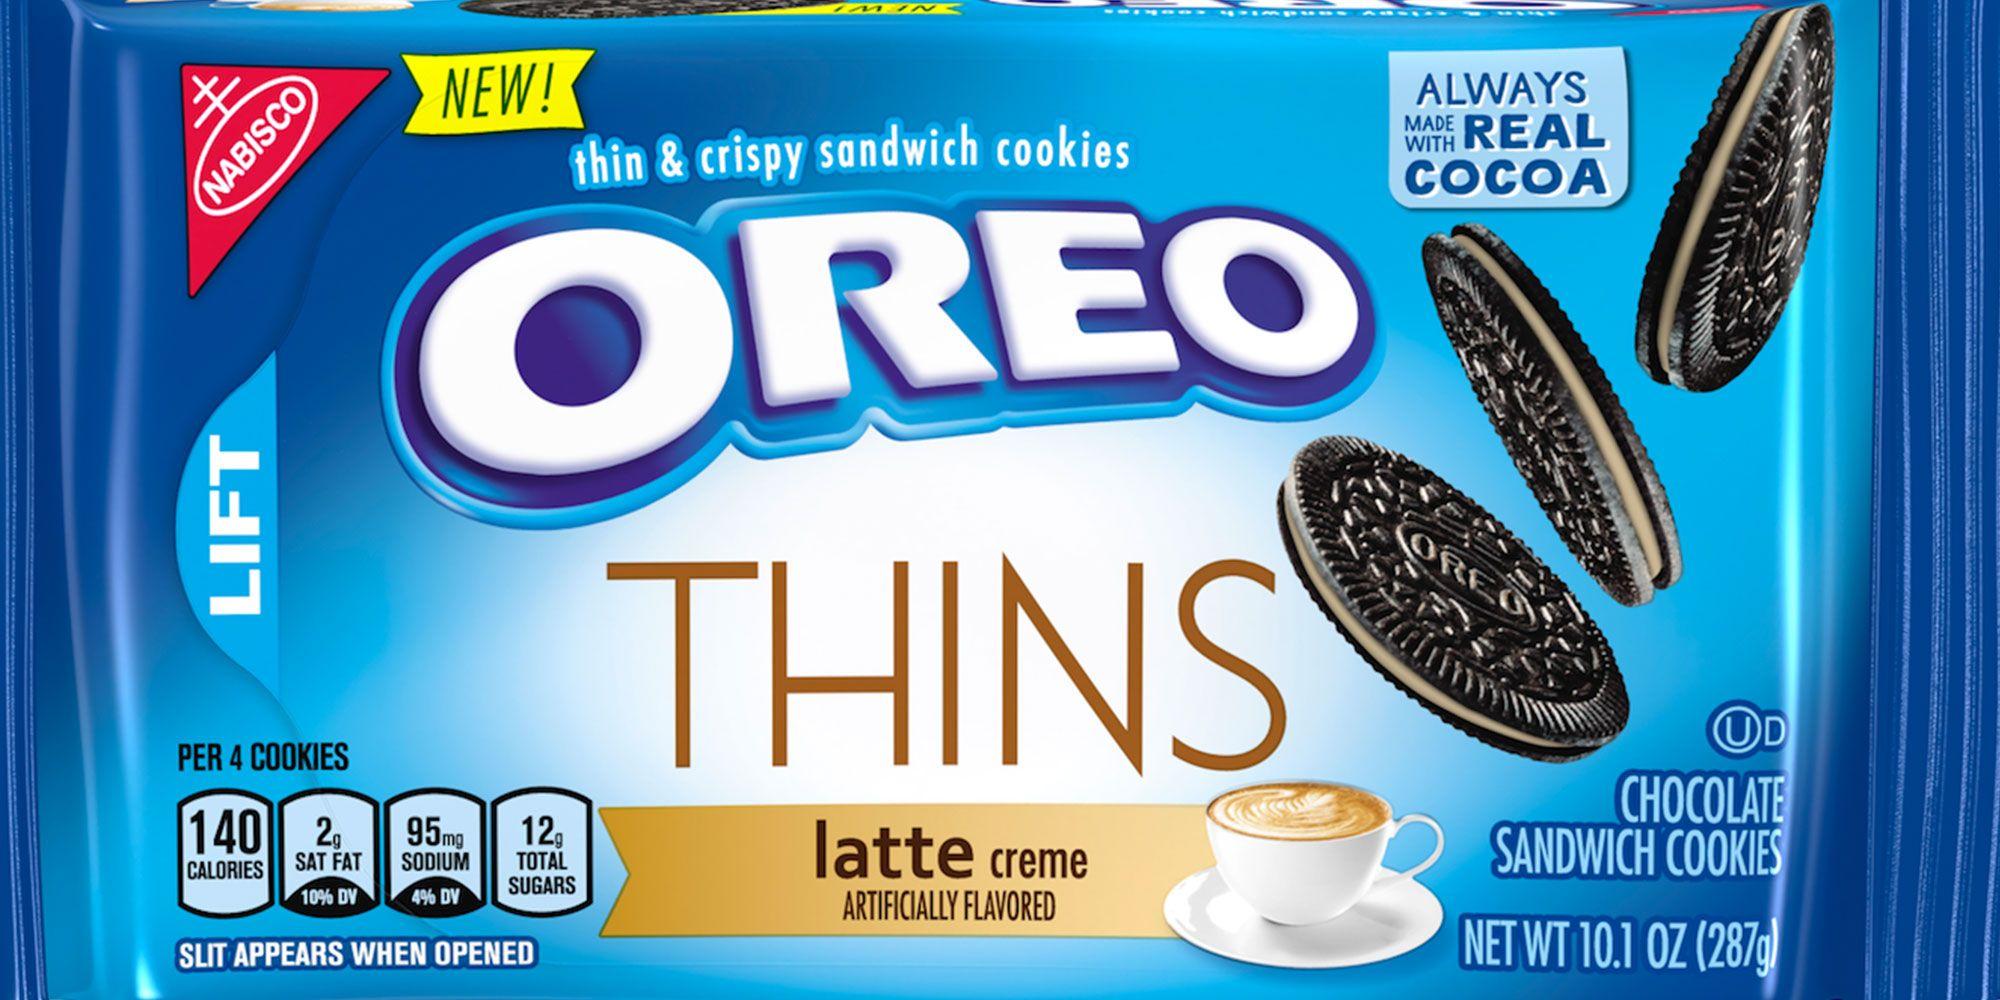 New Oreo Flavors 2020 Oreo Announces Four New Flavors: Thins Latte, Marshmallow Moon